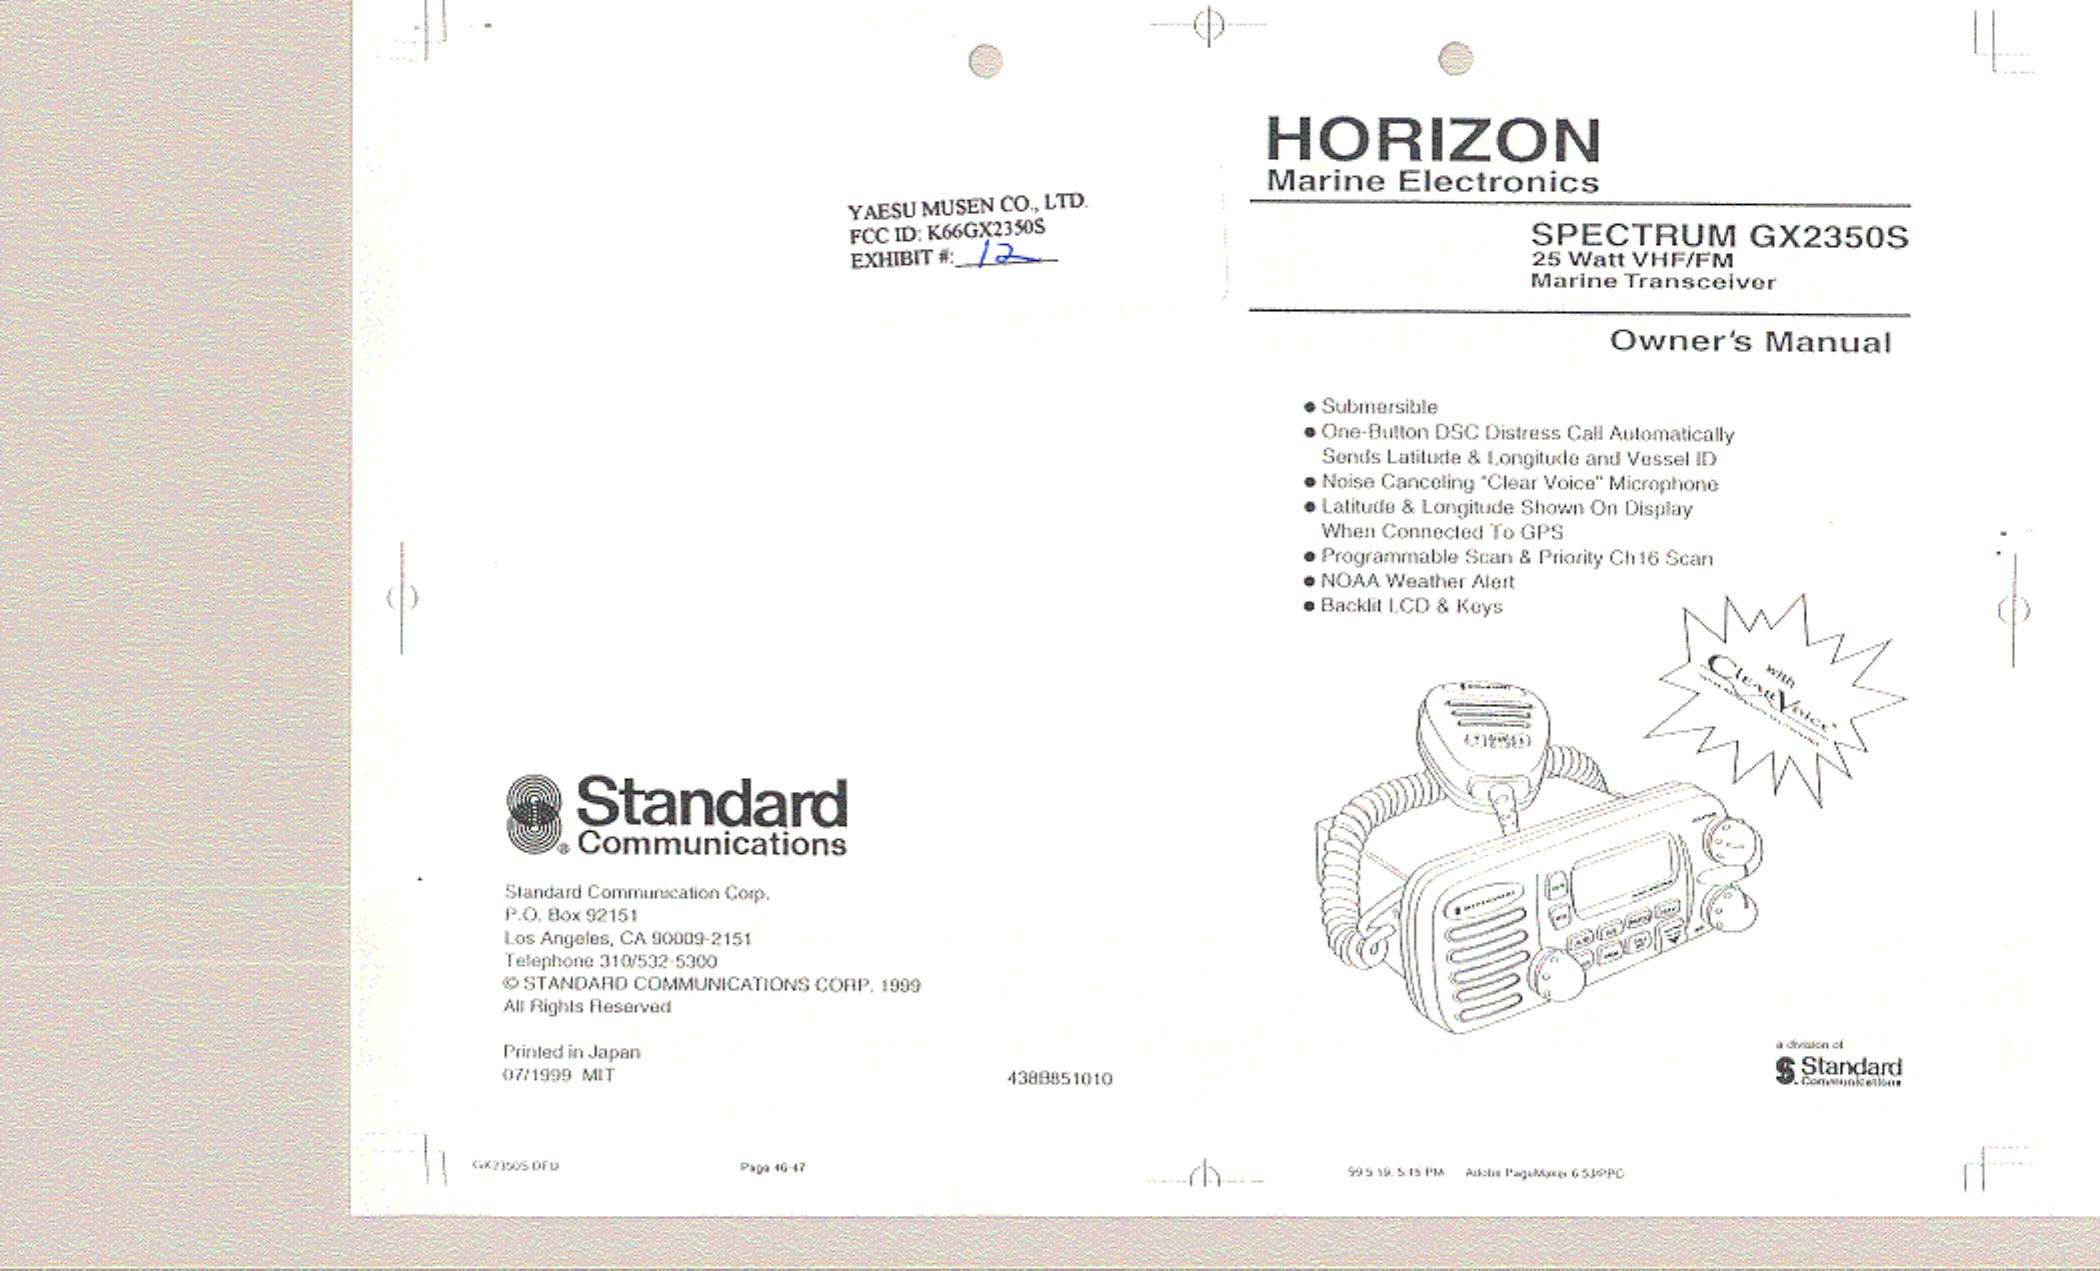 Transmission Diagram Manual Gx2350s Vhf Marine Transmitter User Manual Users Manual Yaesu Musen Of Transmission Diagram Manual